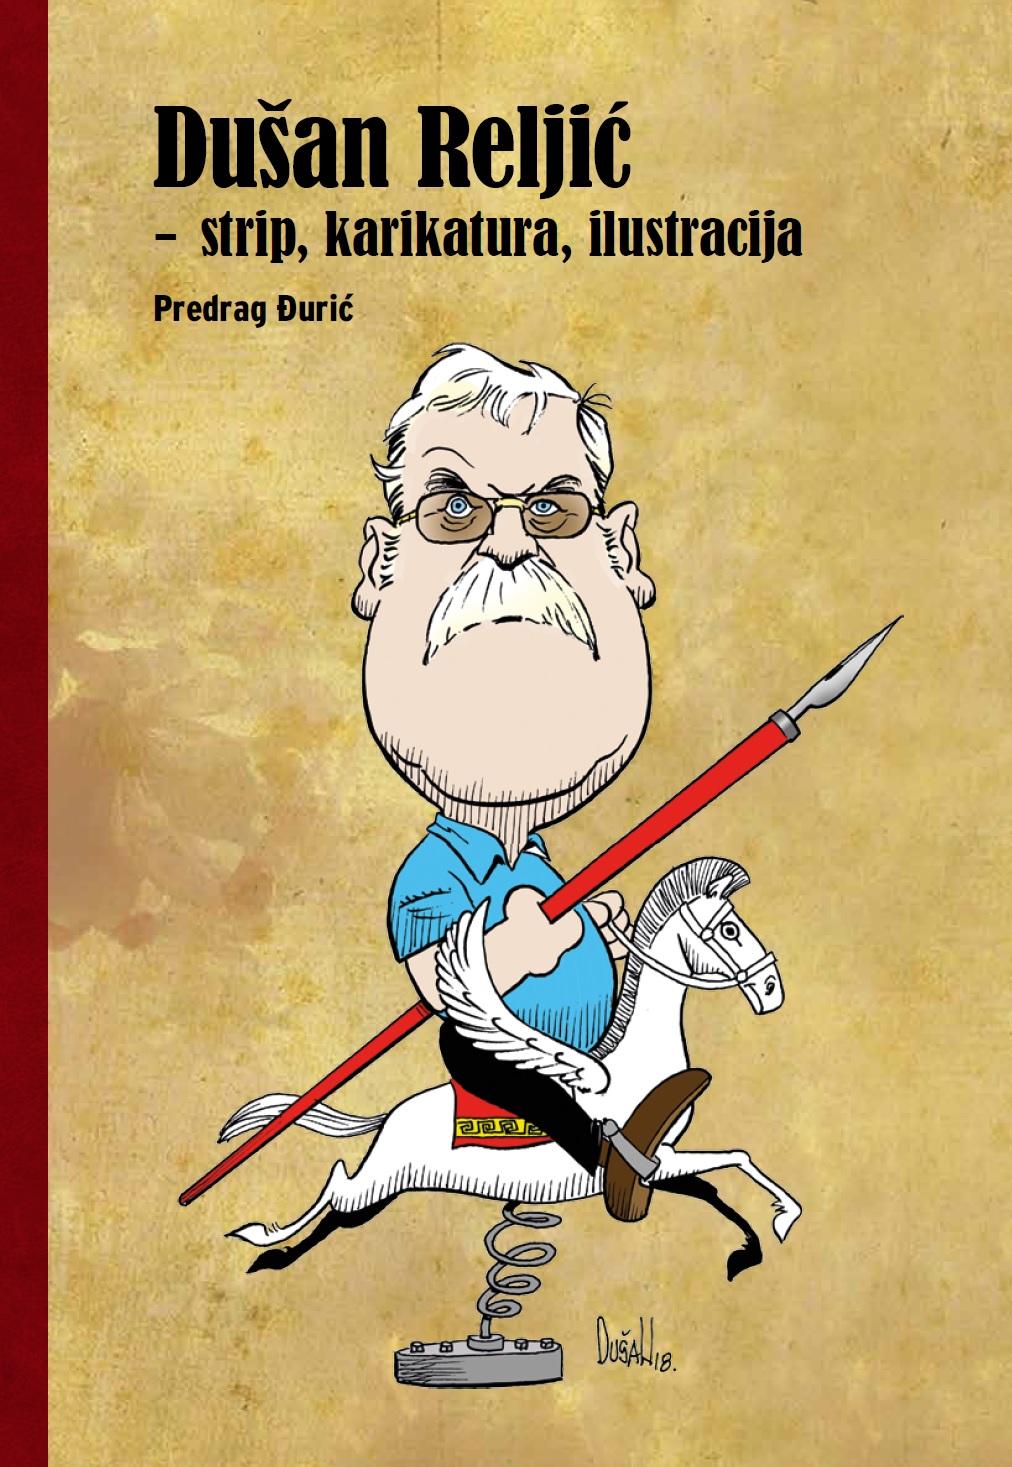 Dušan Reljić- strip, karikatura, ilustracija